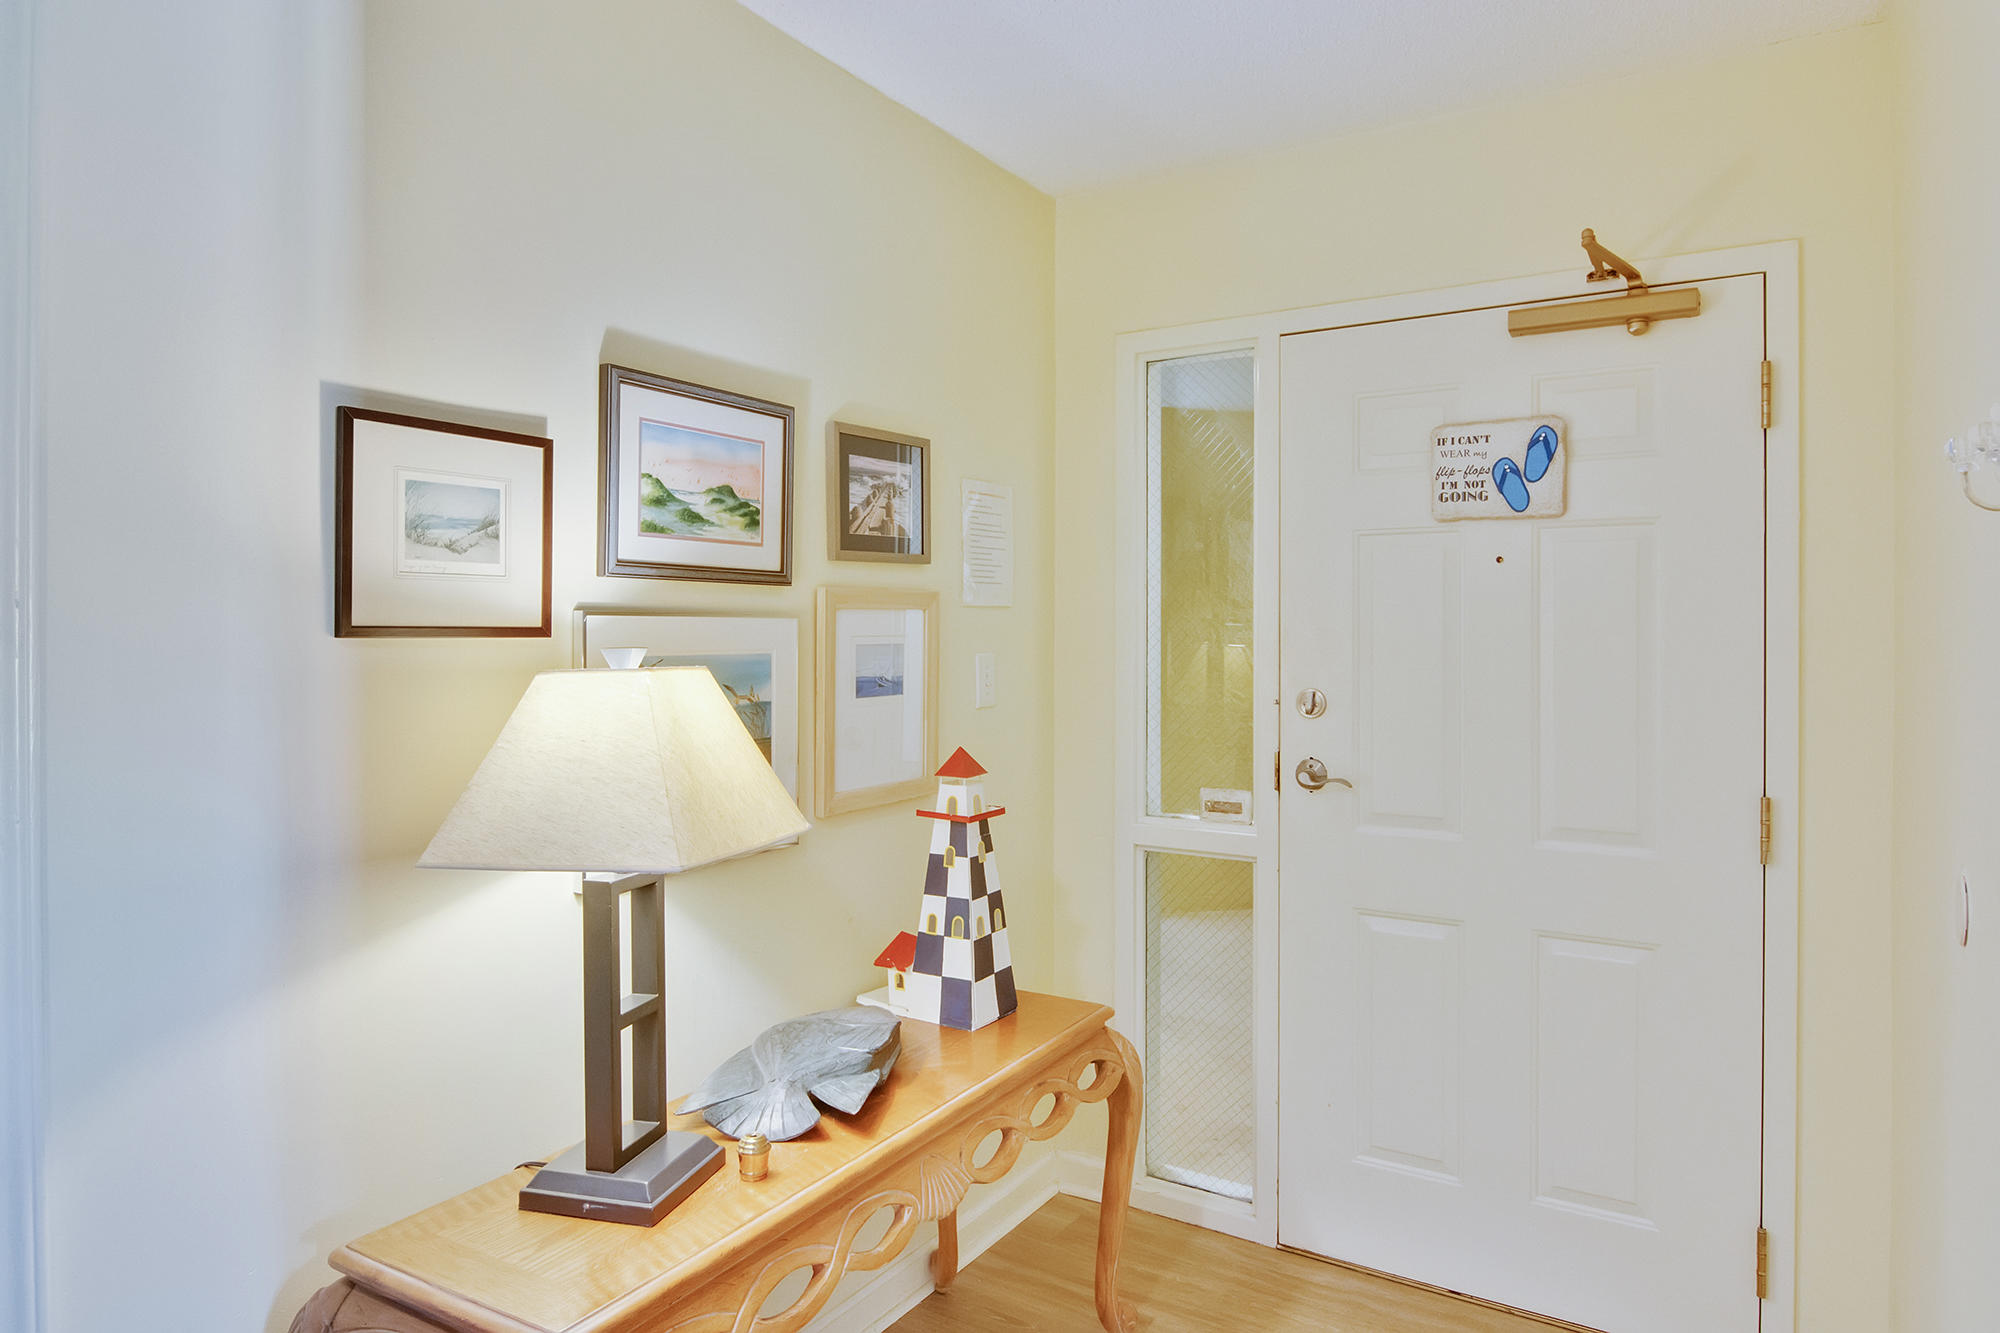 Charleston Oceanfront Villas Homes For Sale - 201 Arctic, Folly Beach, SC - 5